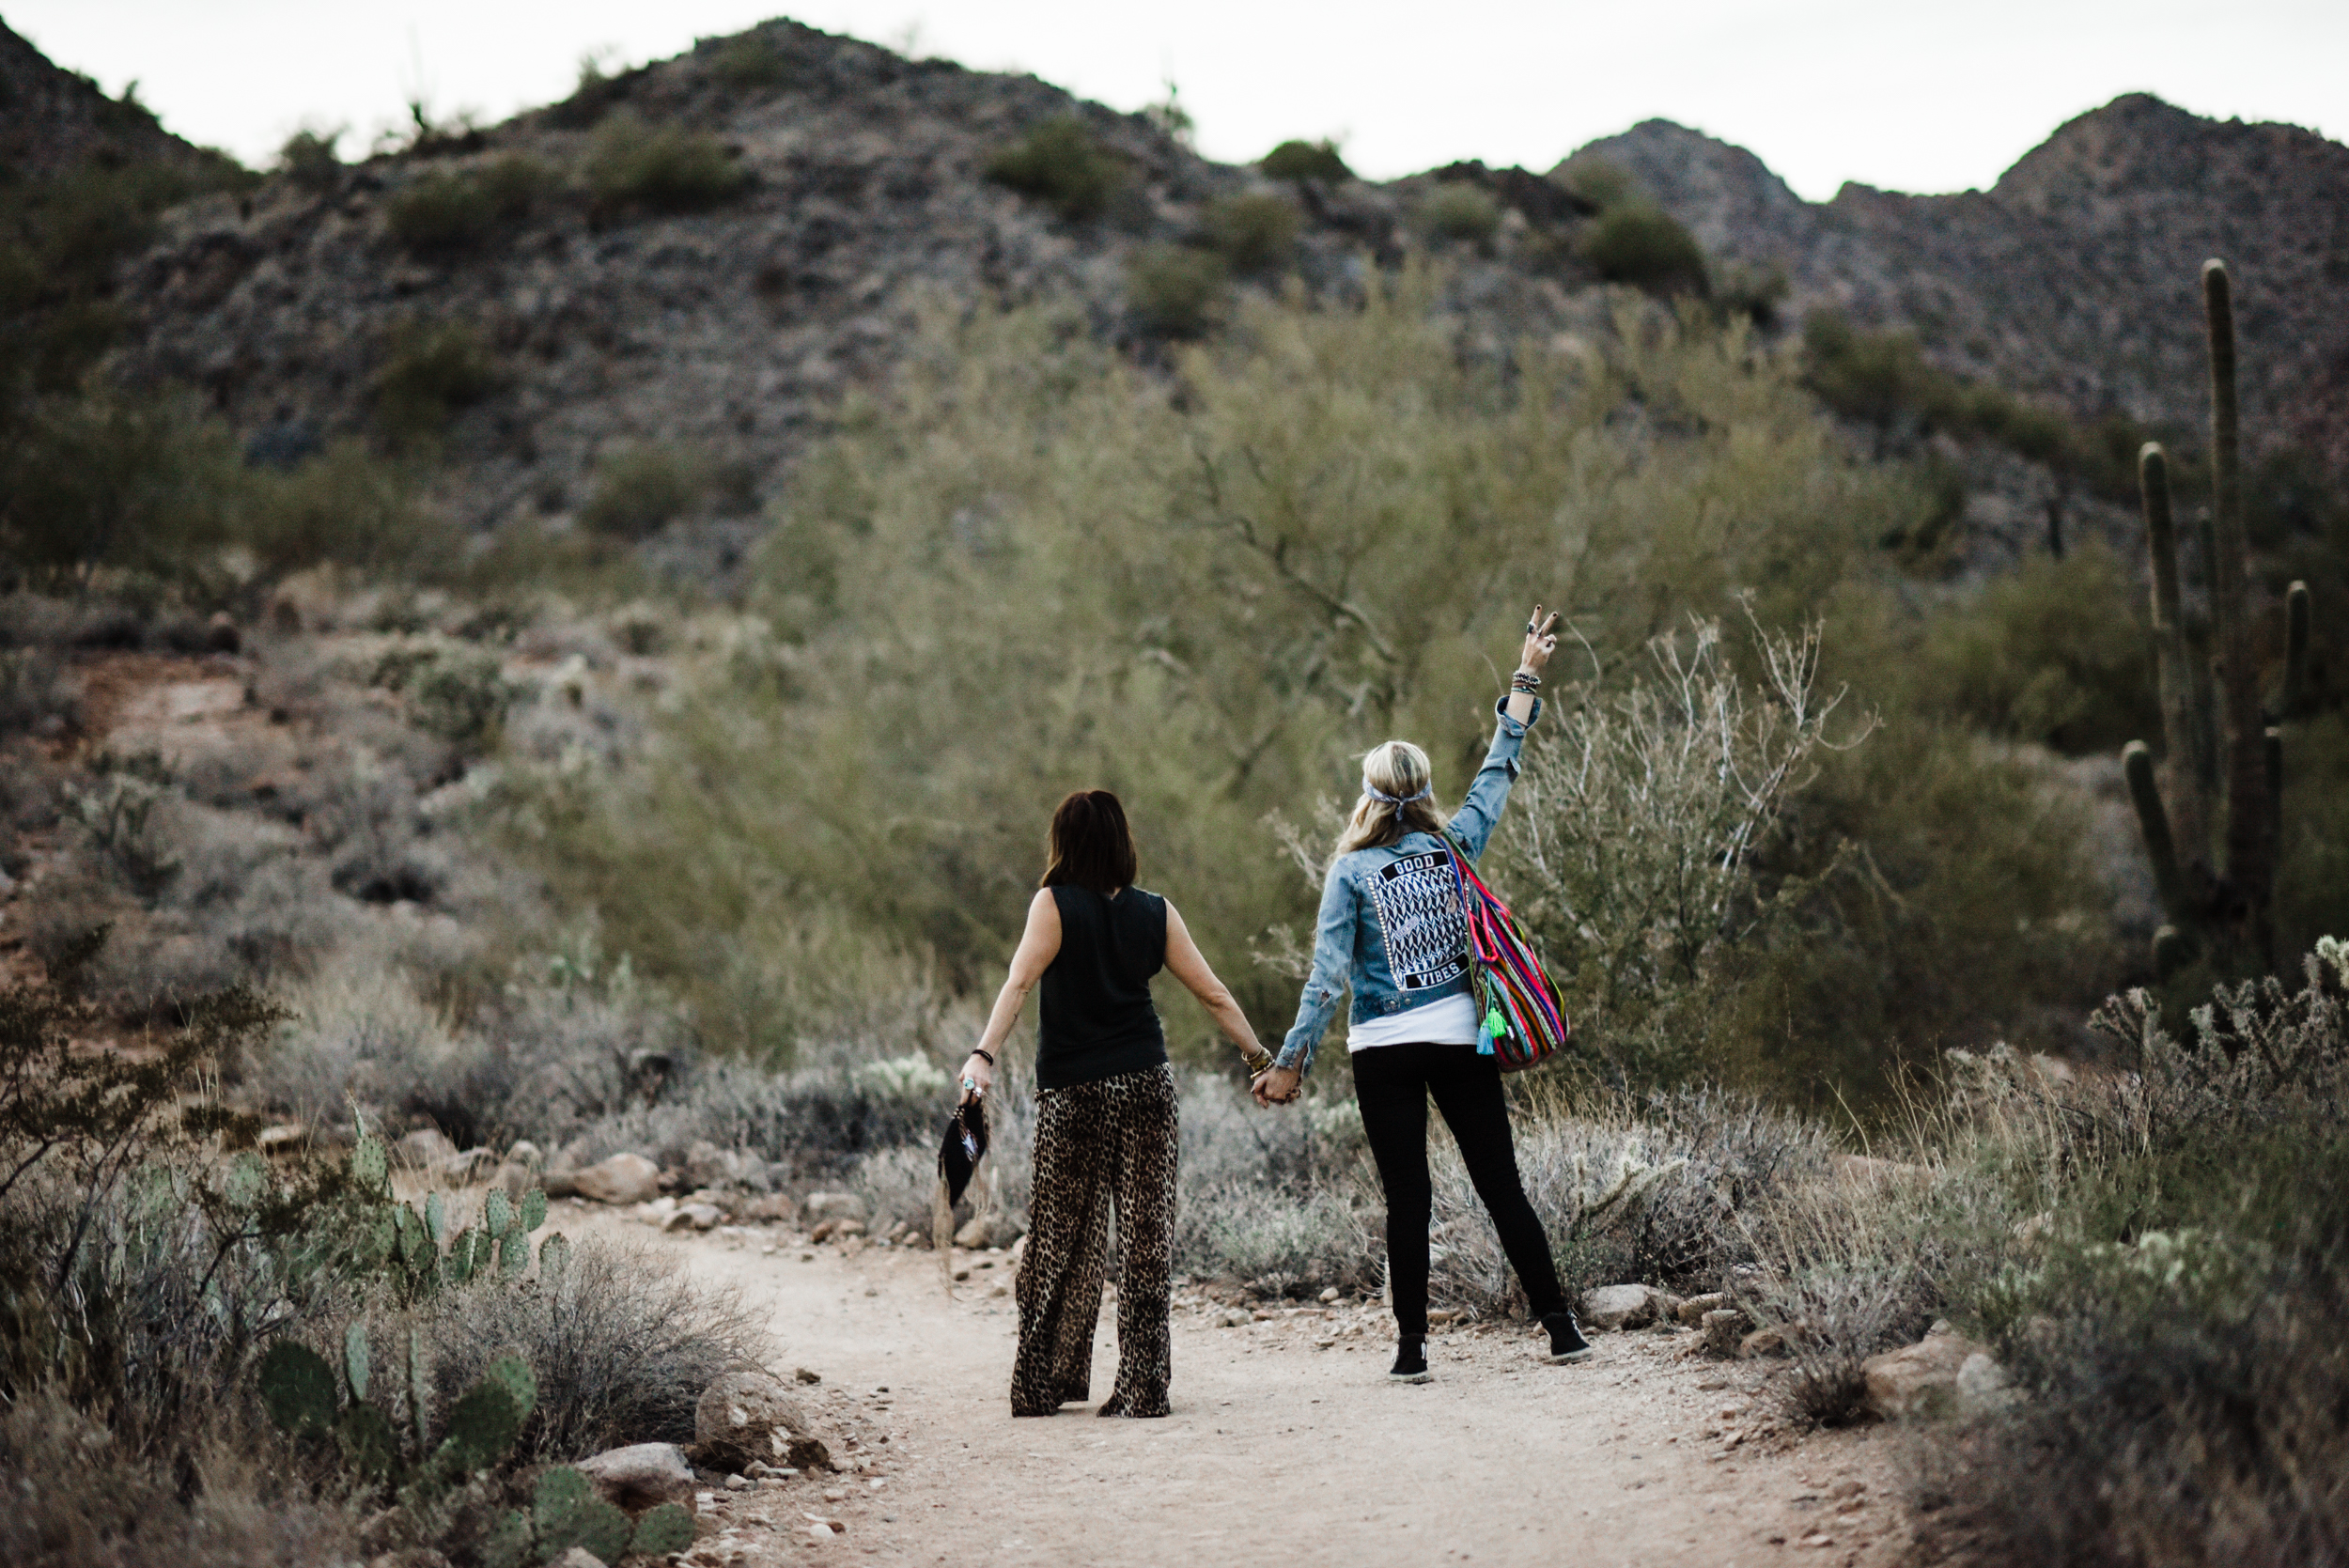 Arizona-love-hippie-momma-bags-boho-7.jpg